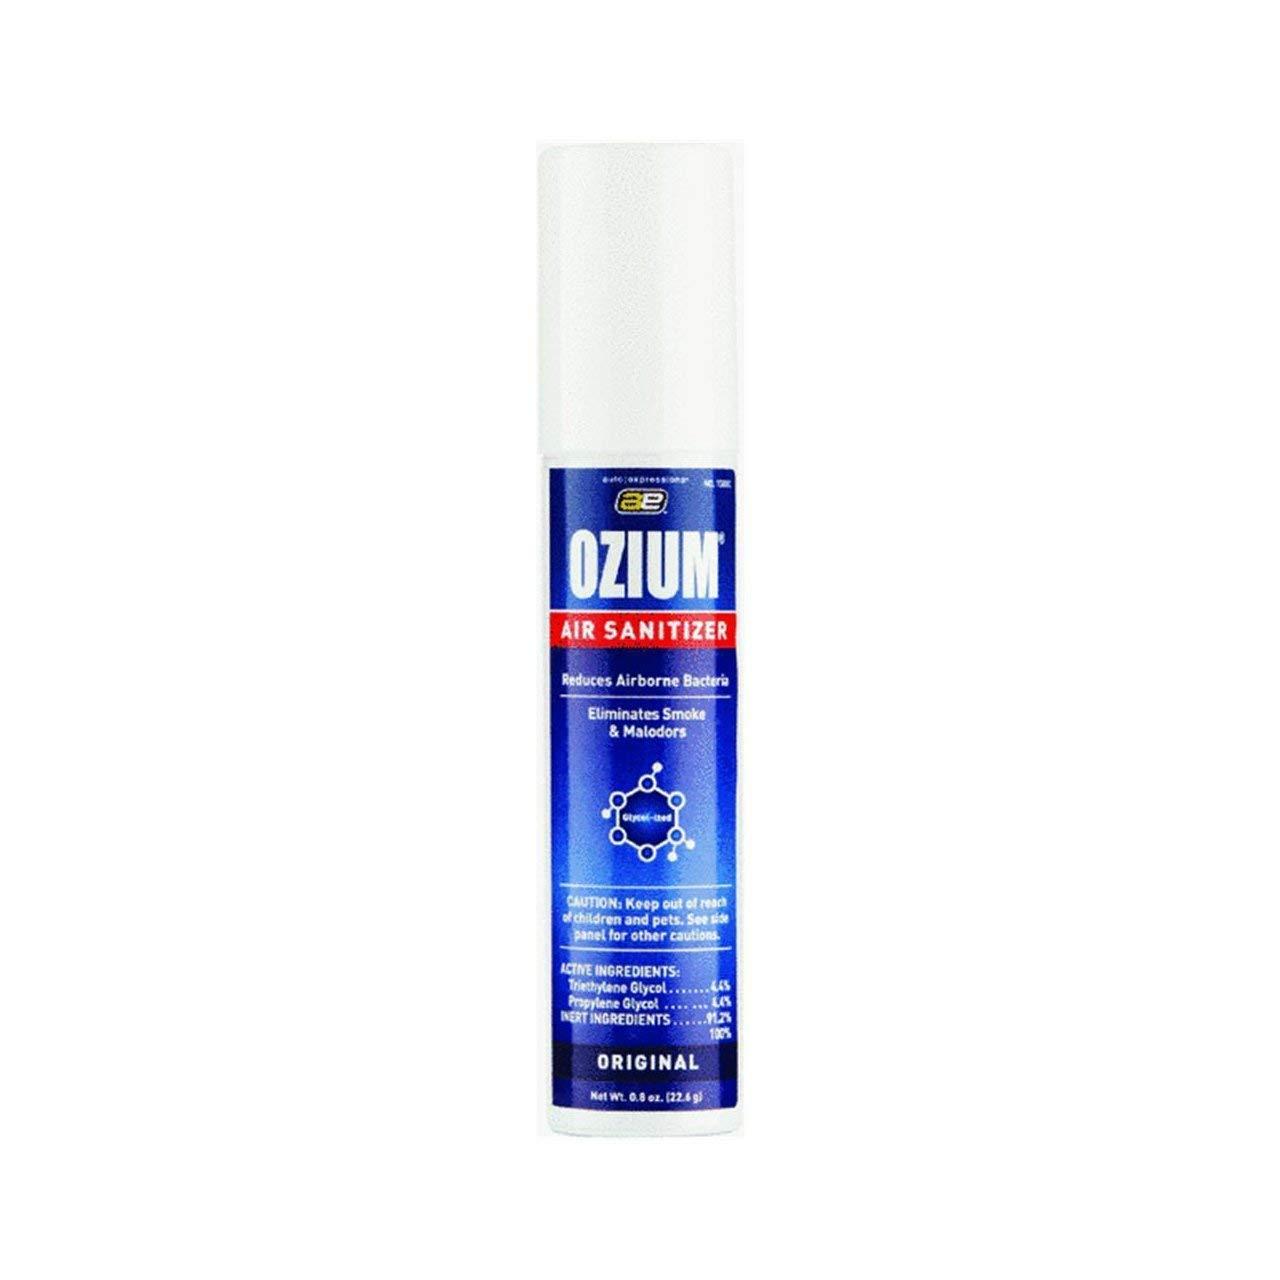 Medo Ozium Glycol-Ized Professional Air Sanitizer/Freshener Original Scent, 0.8 oz. aerosol (OZ-1), 6 Pack by Medo (Image #5)